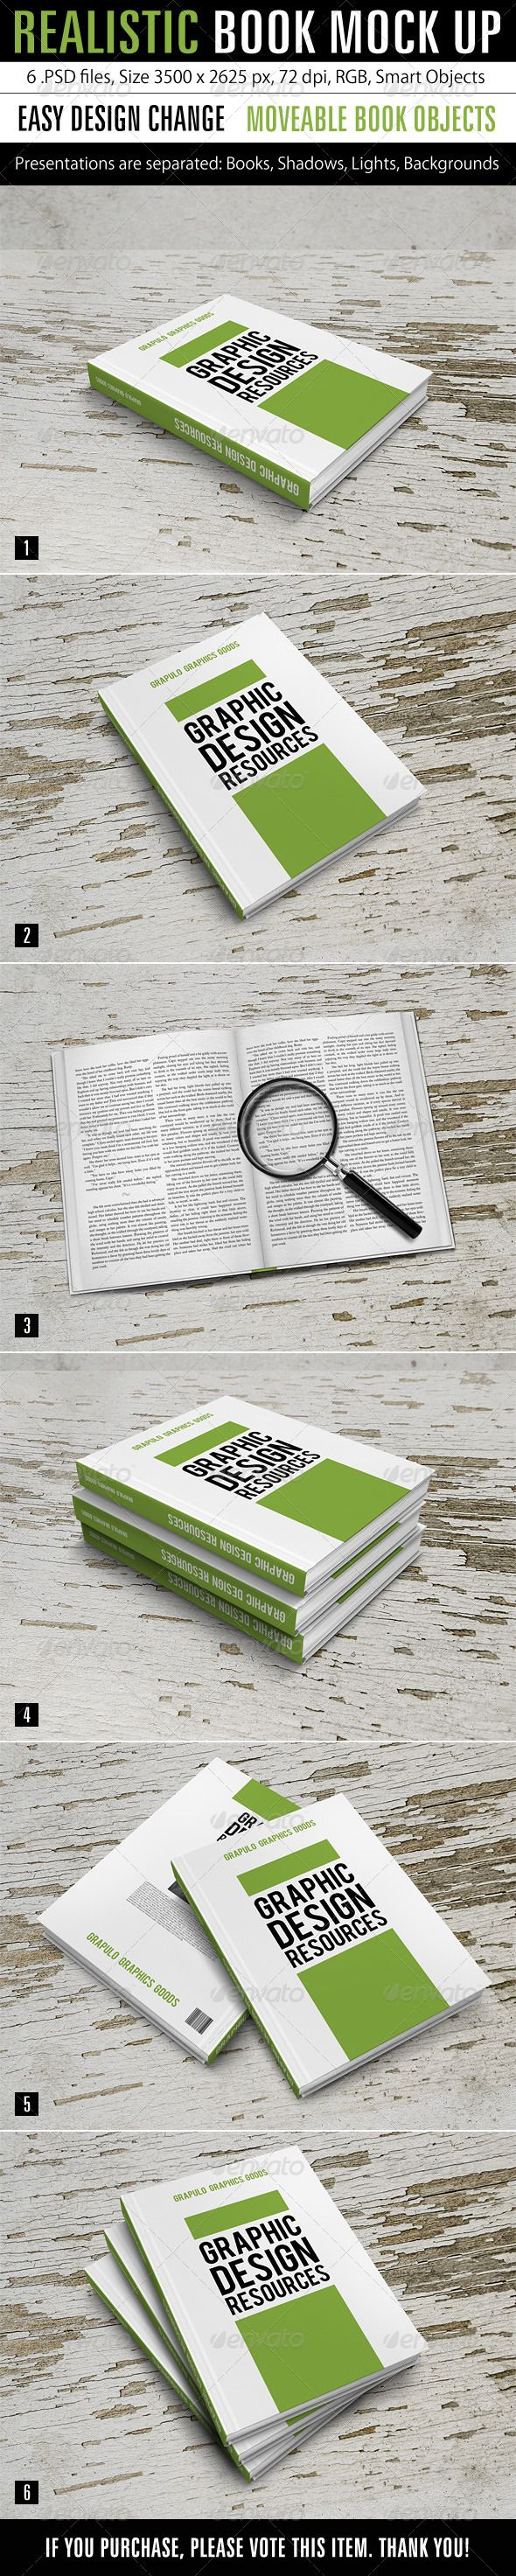 57 best PSD Book Mockup images on Pinterest | Mock up, Broschüren ...